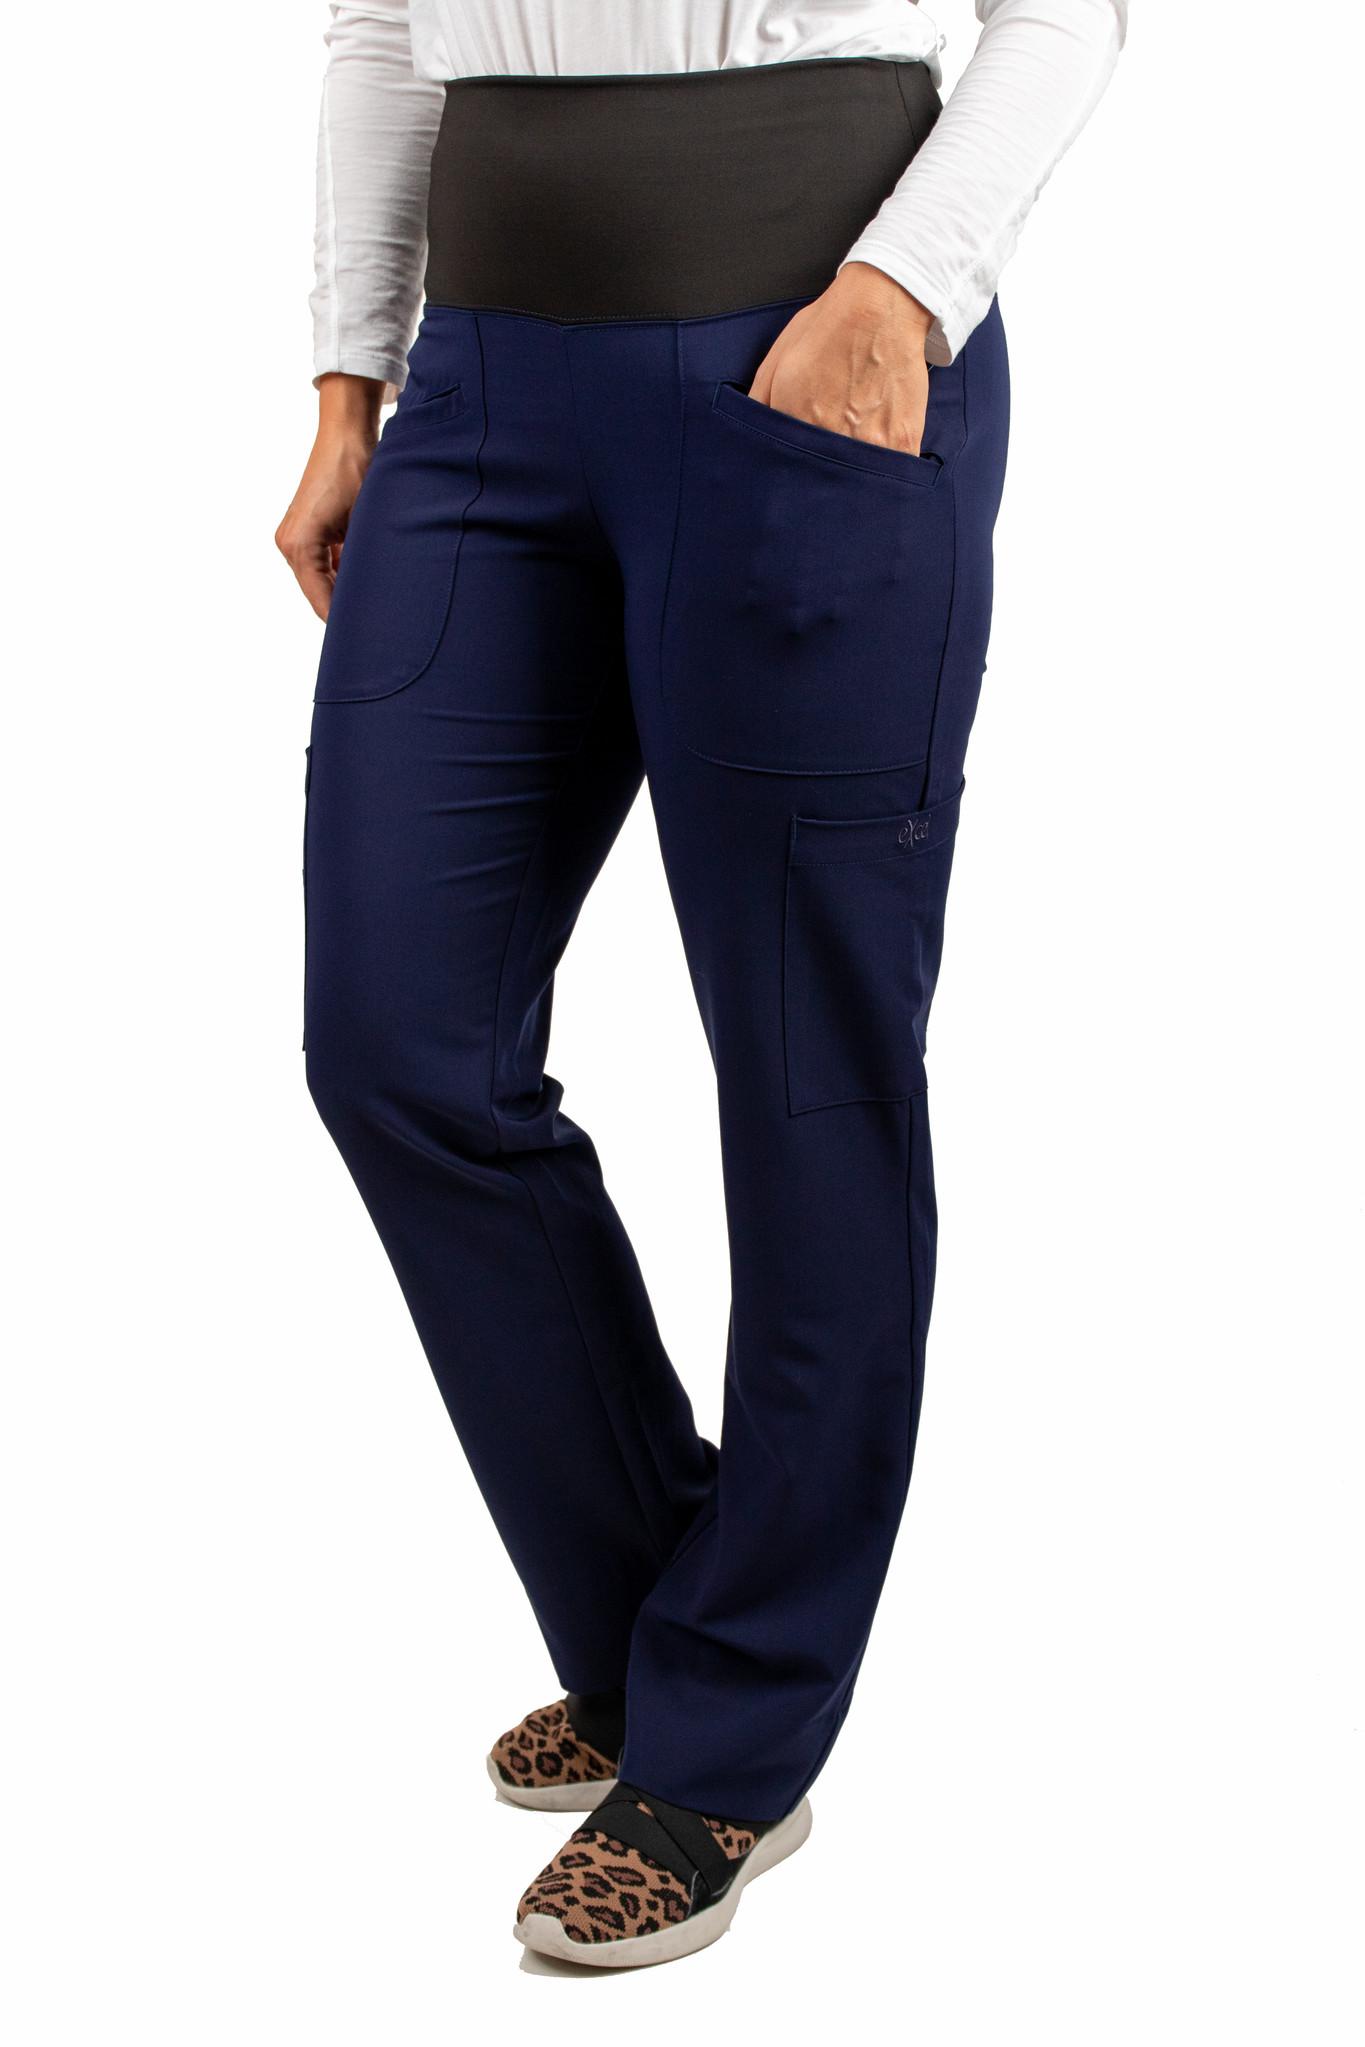 Navy Blue Women's Yoga Waistband Excel Pants 985